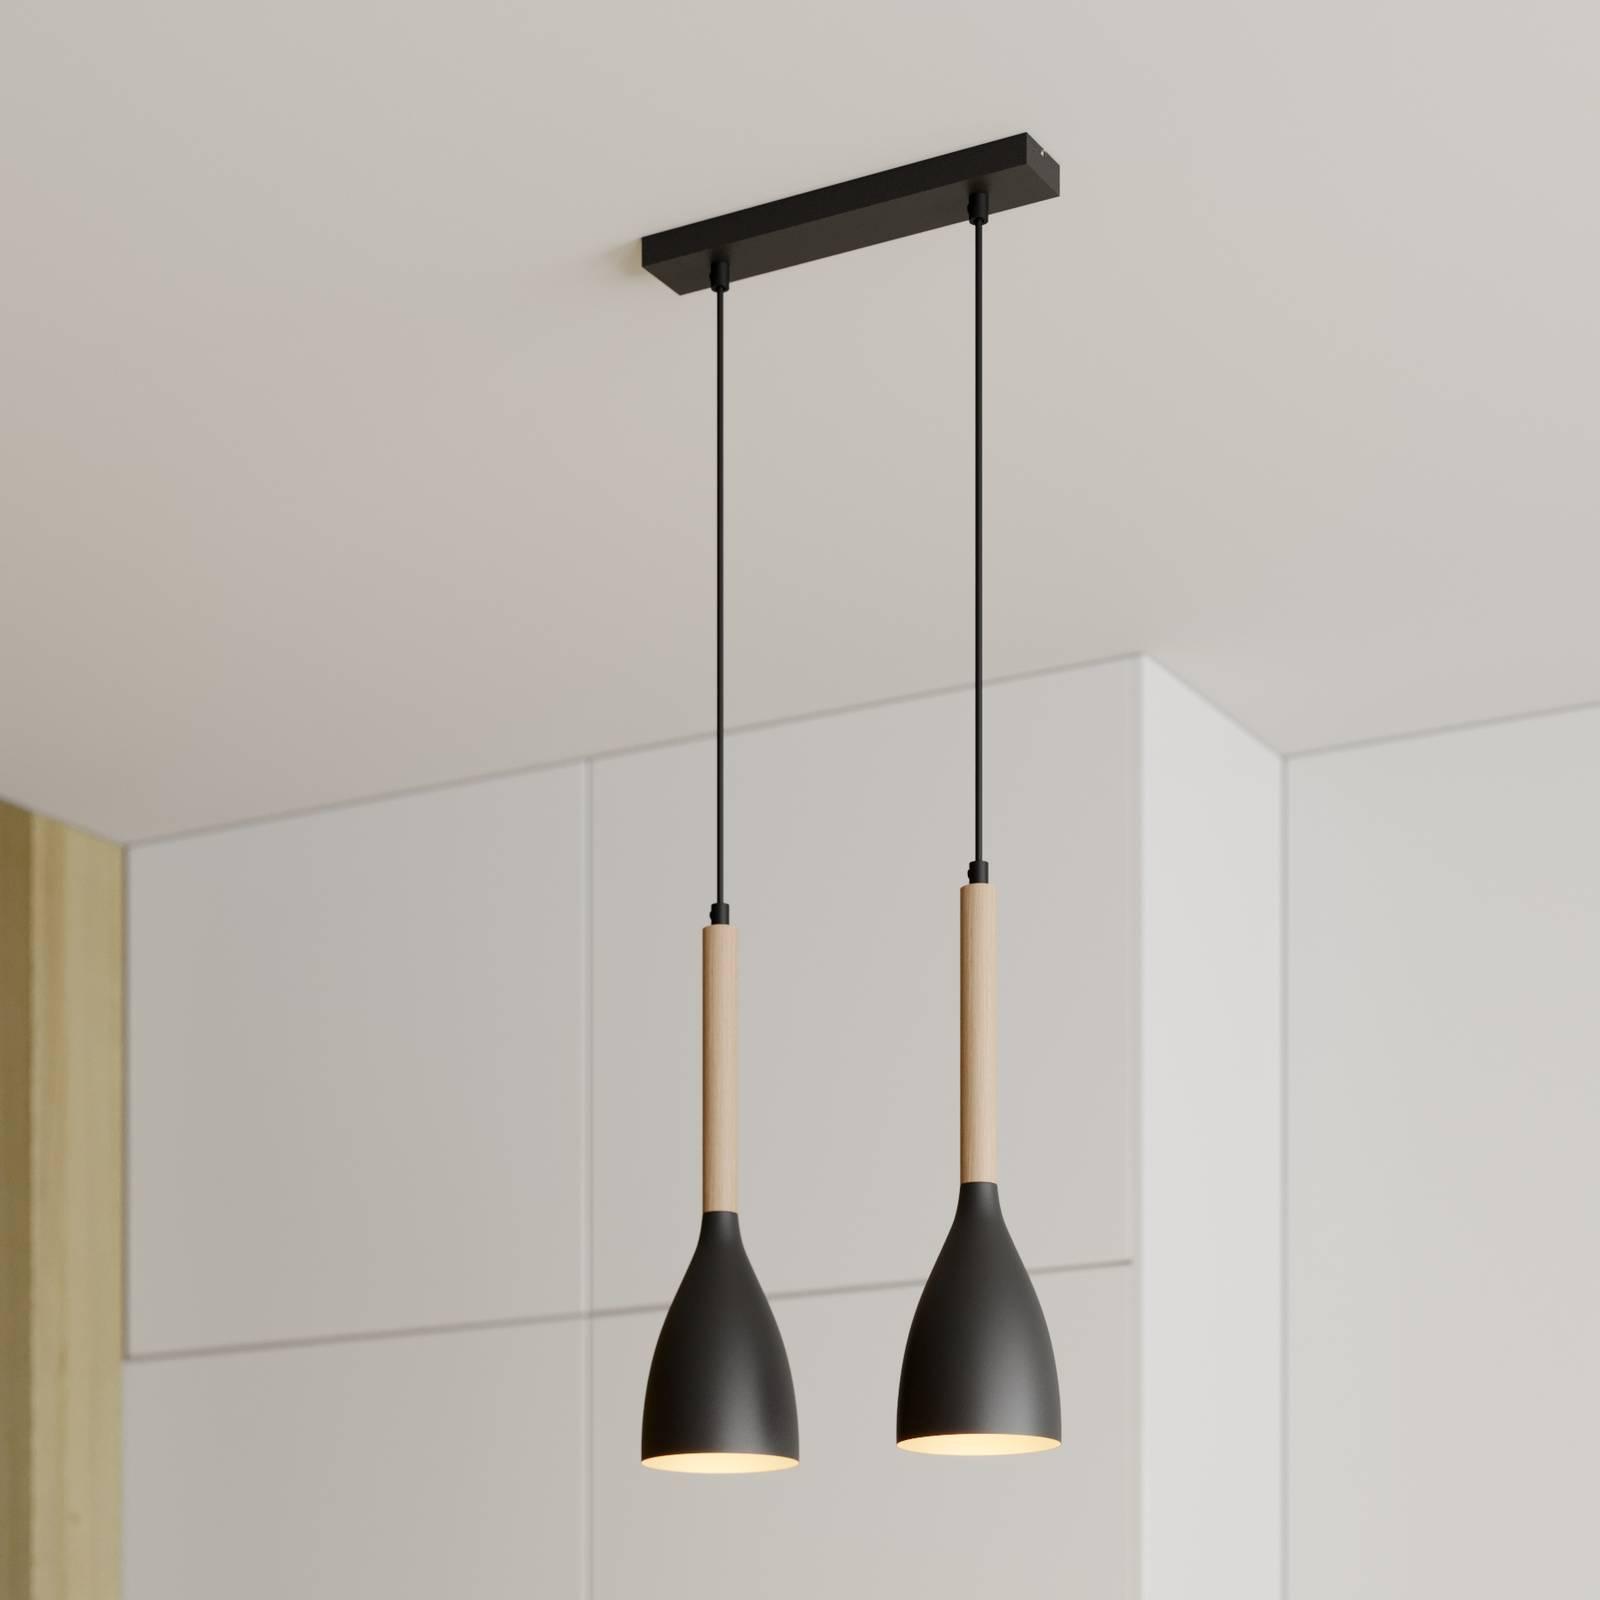 Hanglamp Muza, 2-lamps, zwart/goud